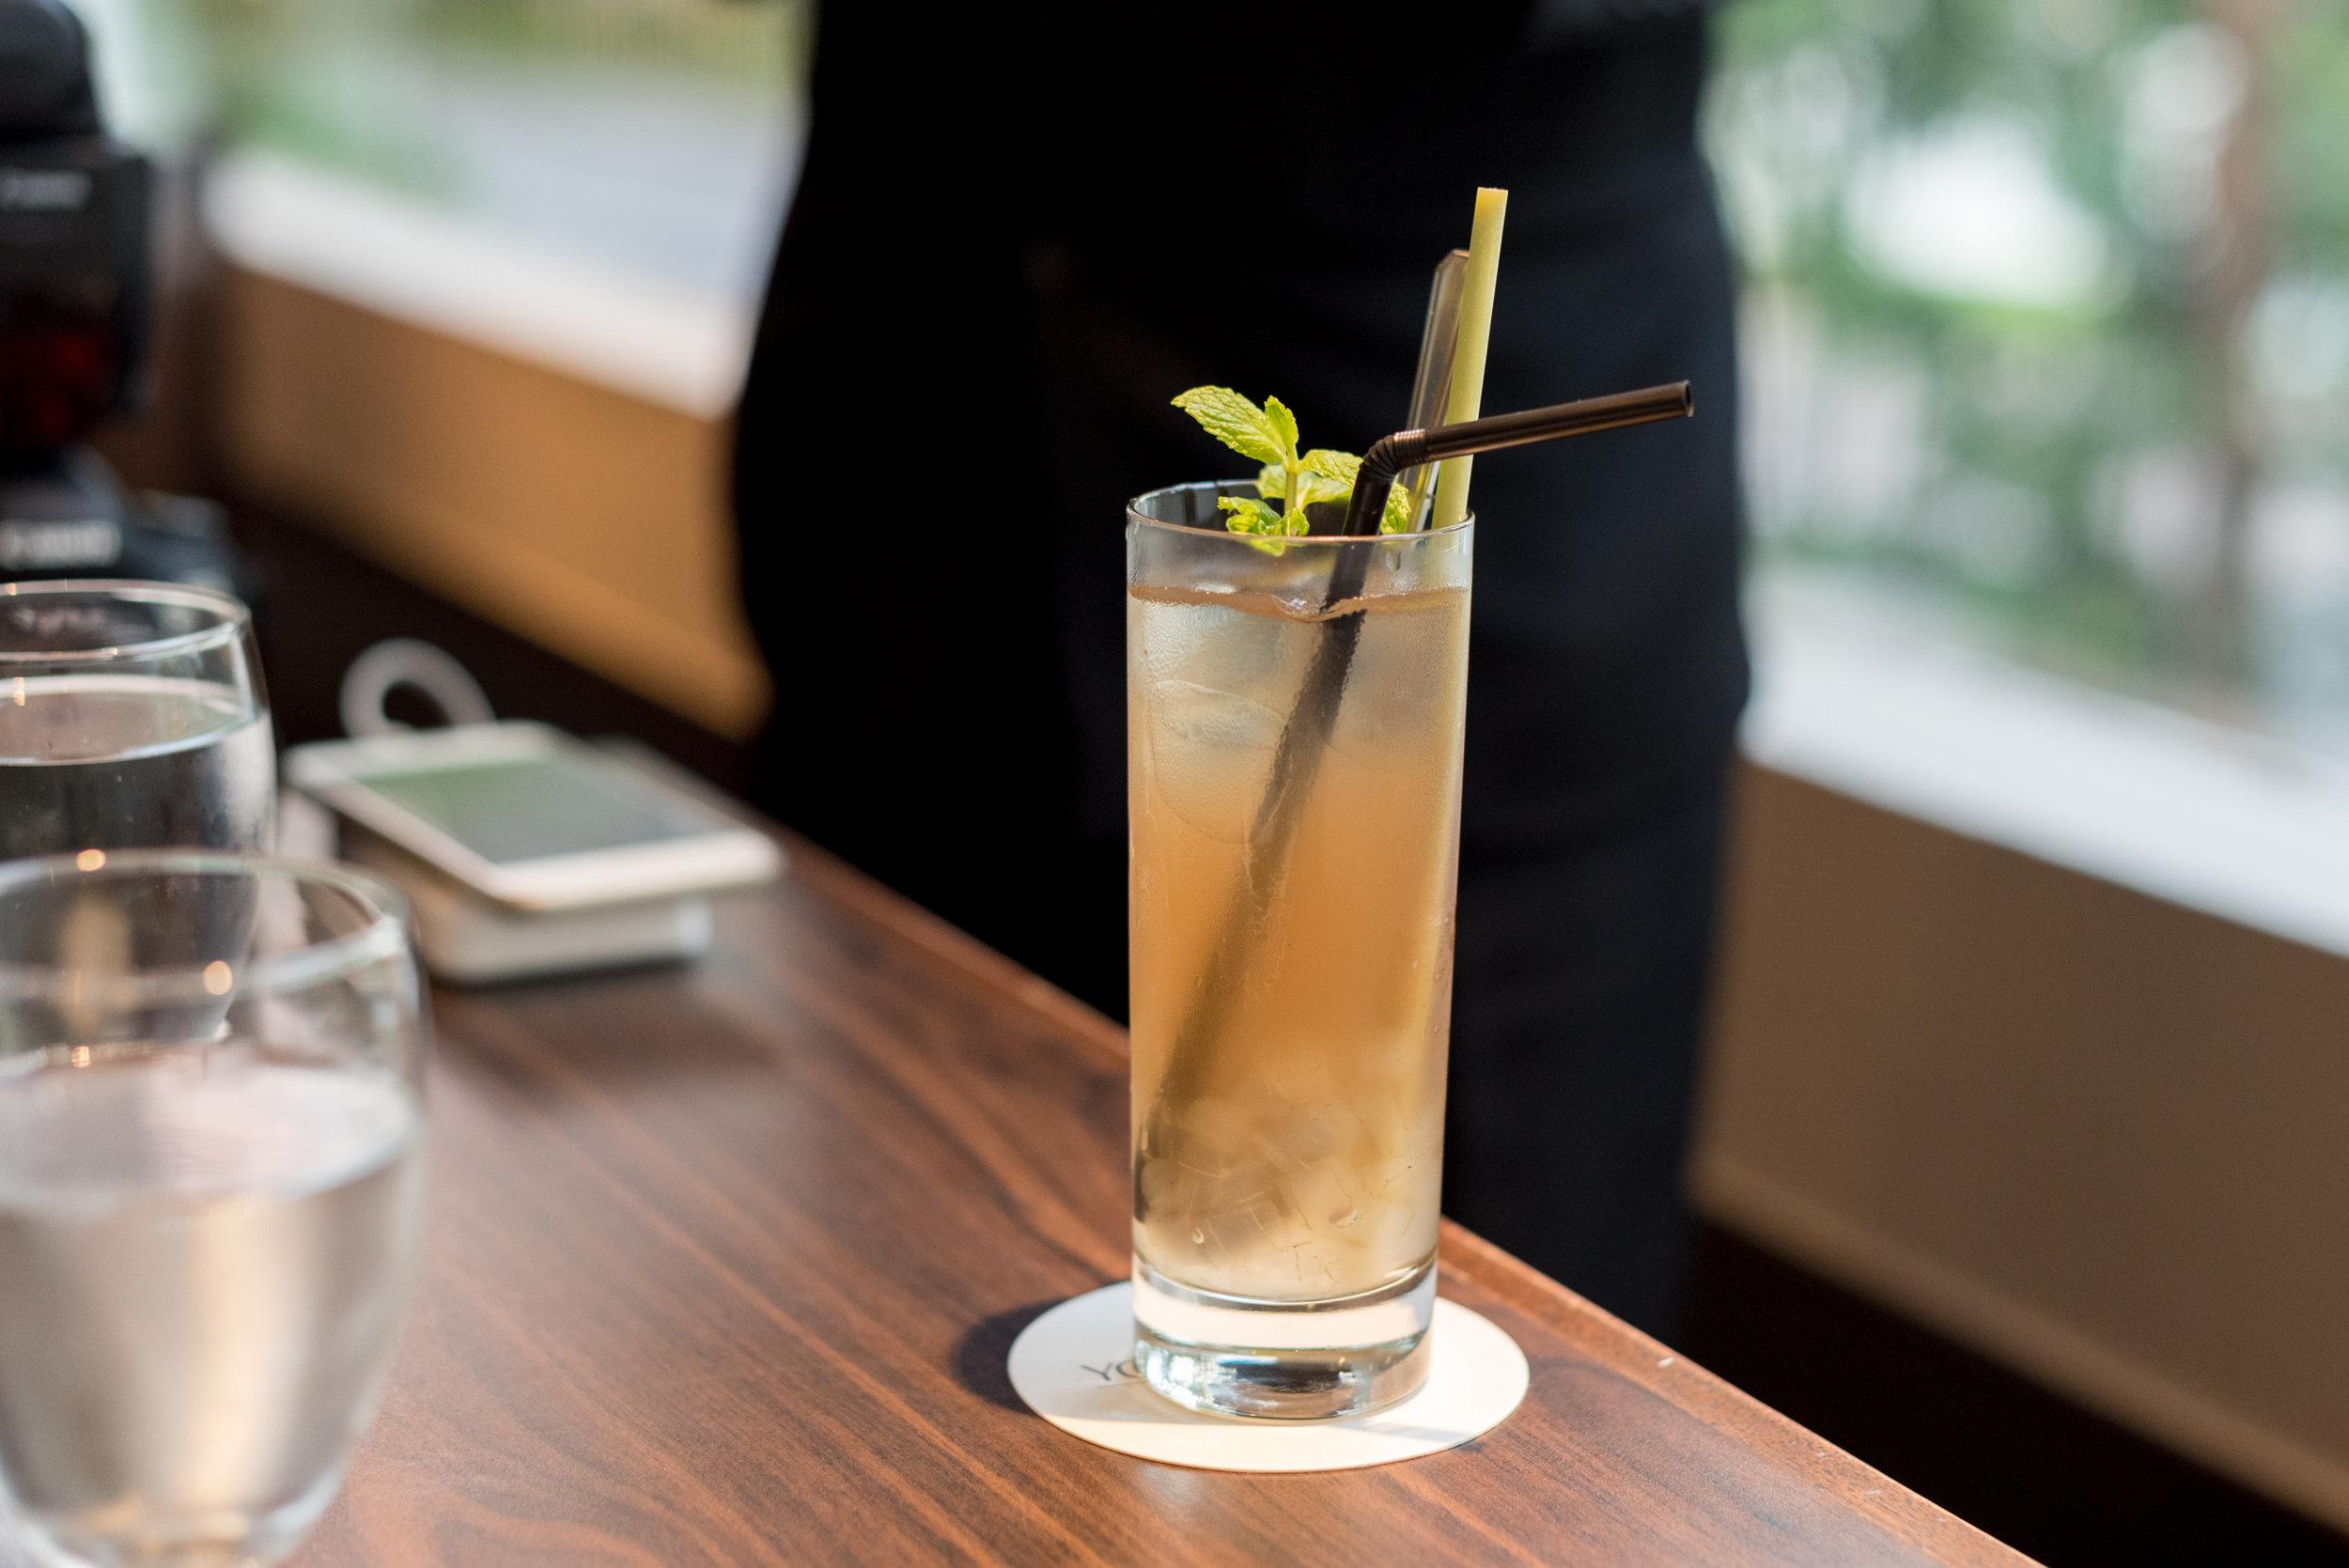 Chilled Lemongrass Drink with Aloe Vera  White Rose Café - York Hotel Singapore